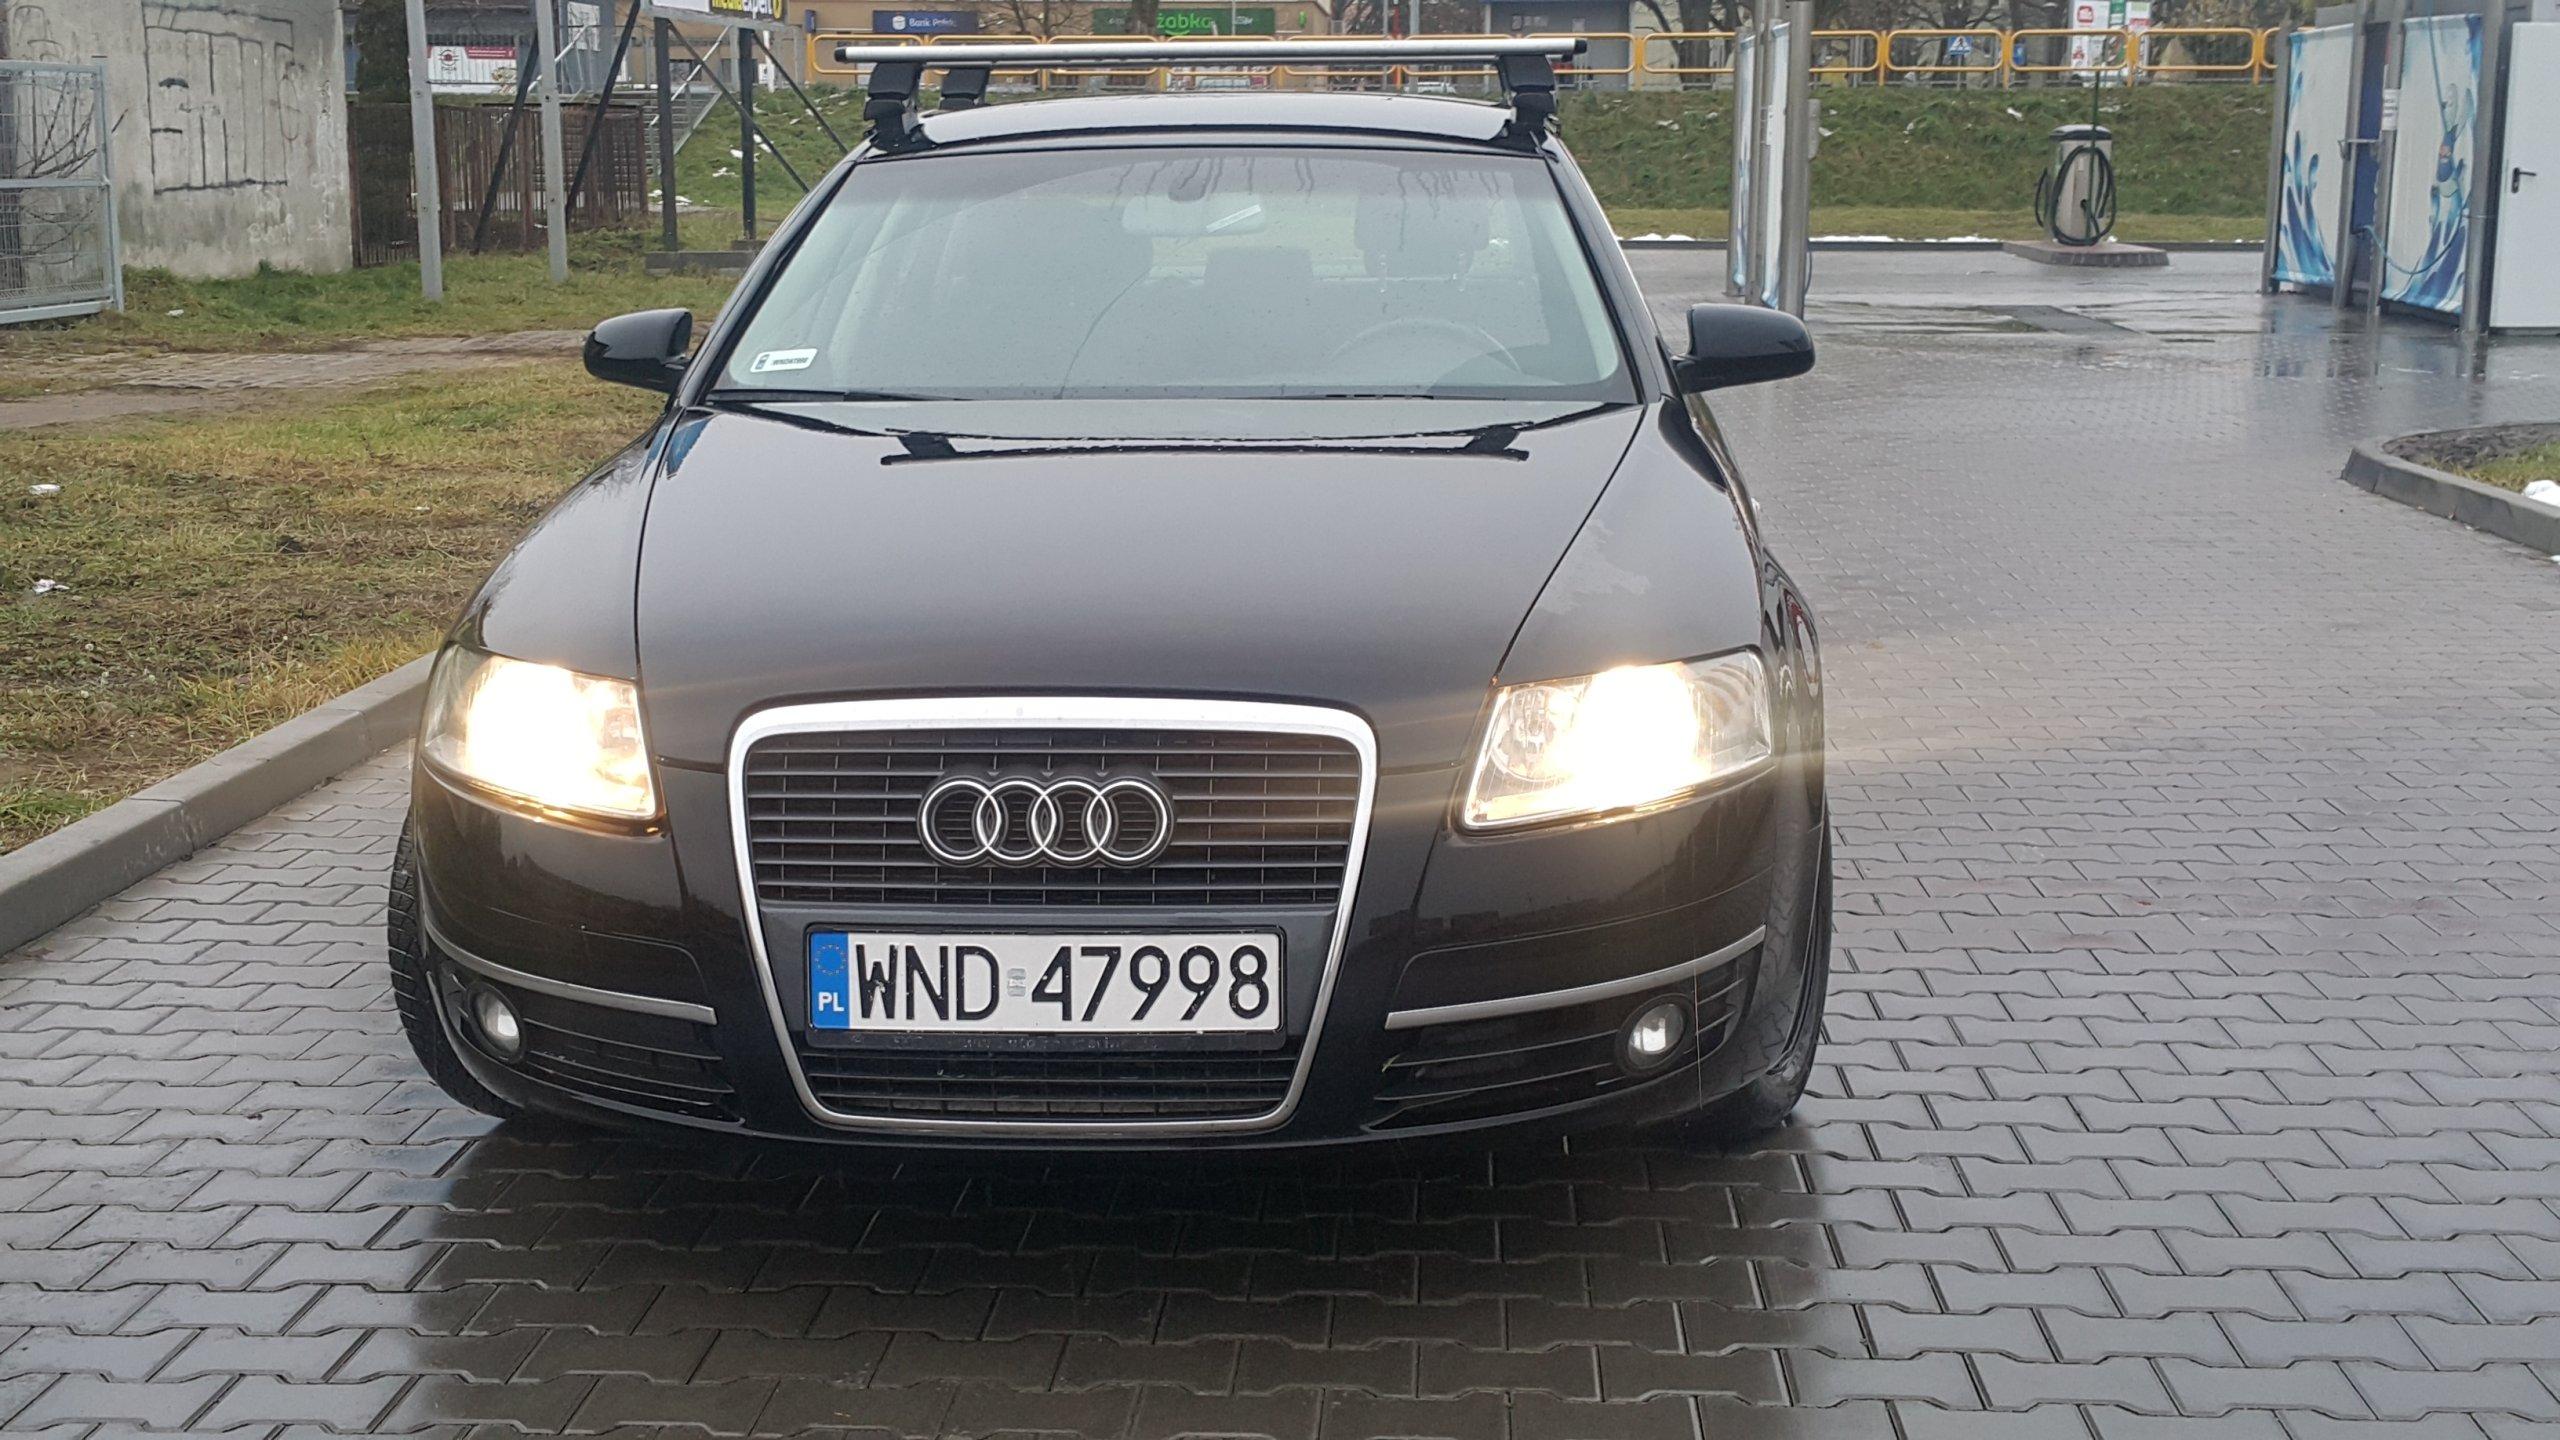 Audi A6 sedan 2.0 tdi -  zadbany i bezwypadkowy!